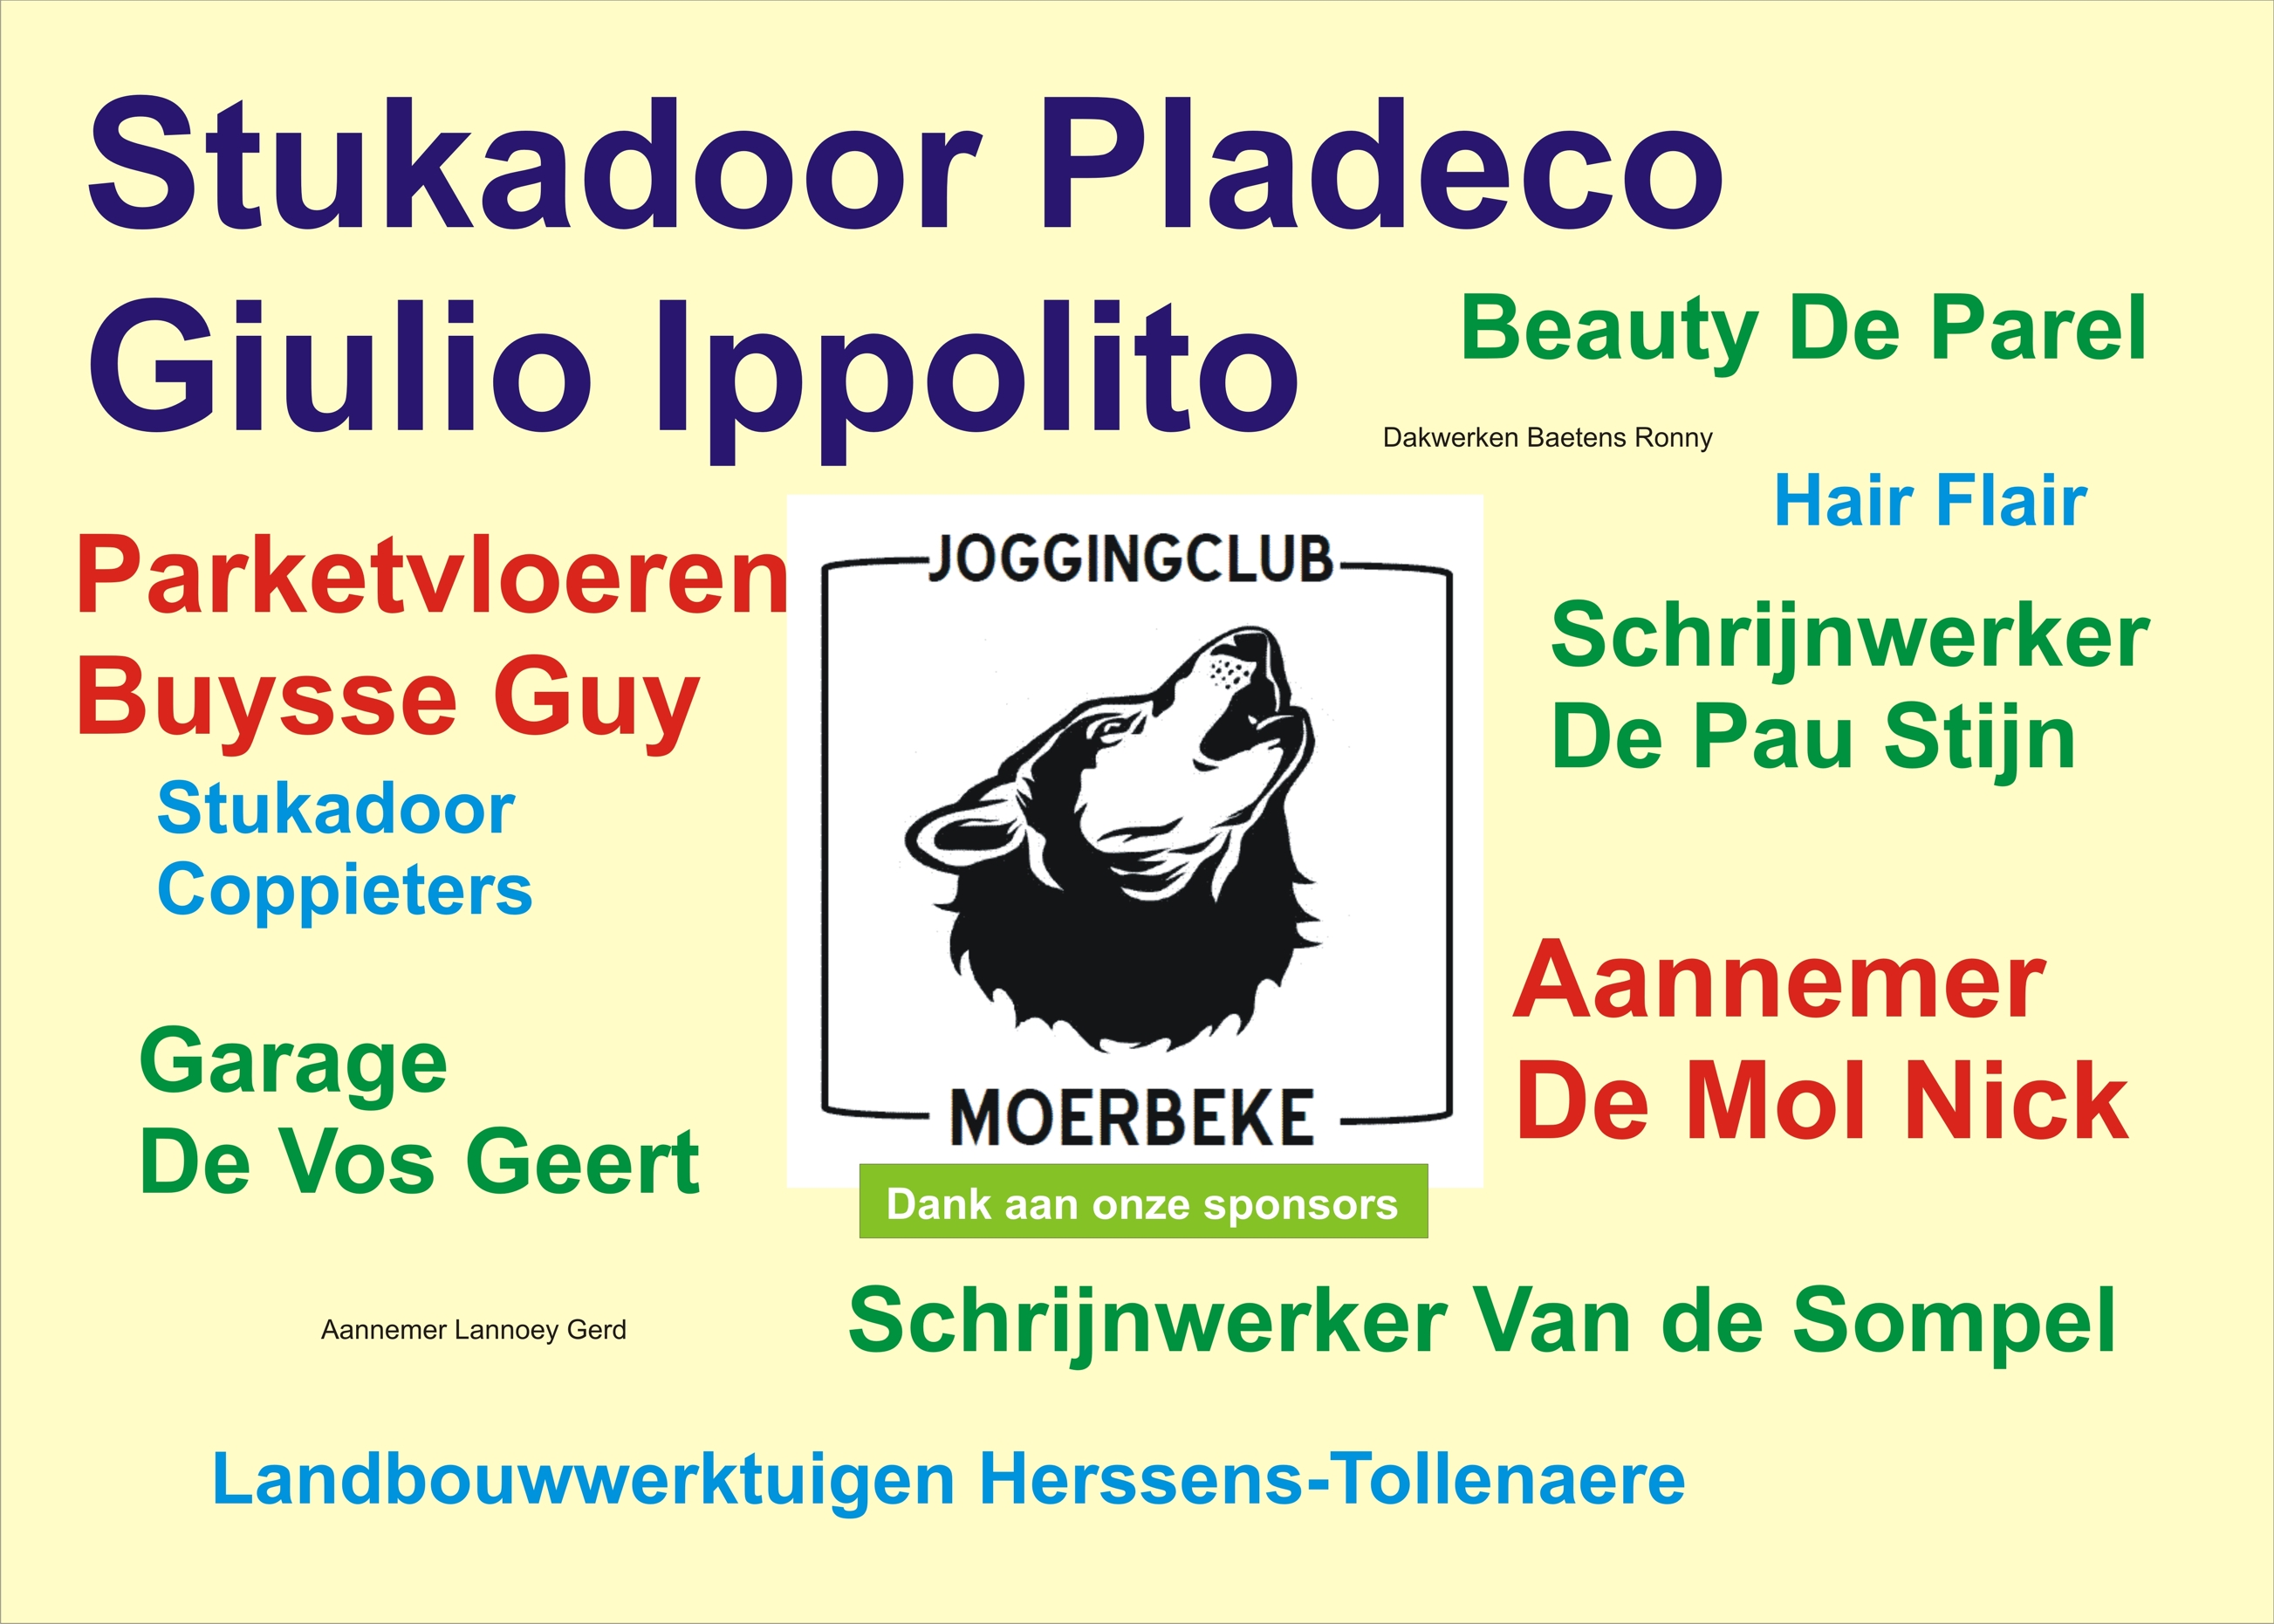 http://www.joggingclubmoerbeke.be/2014/mhl/mhlspons04.jpg